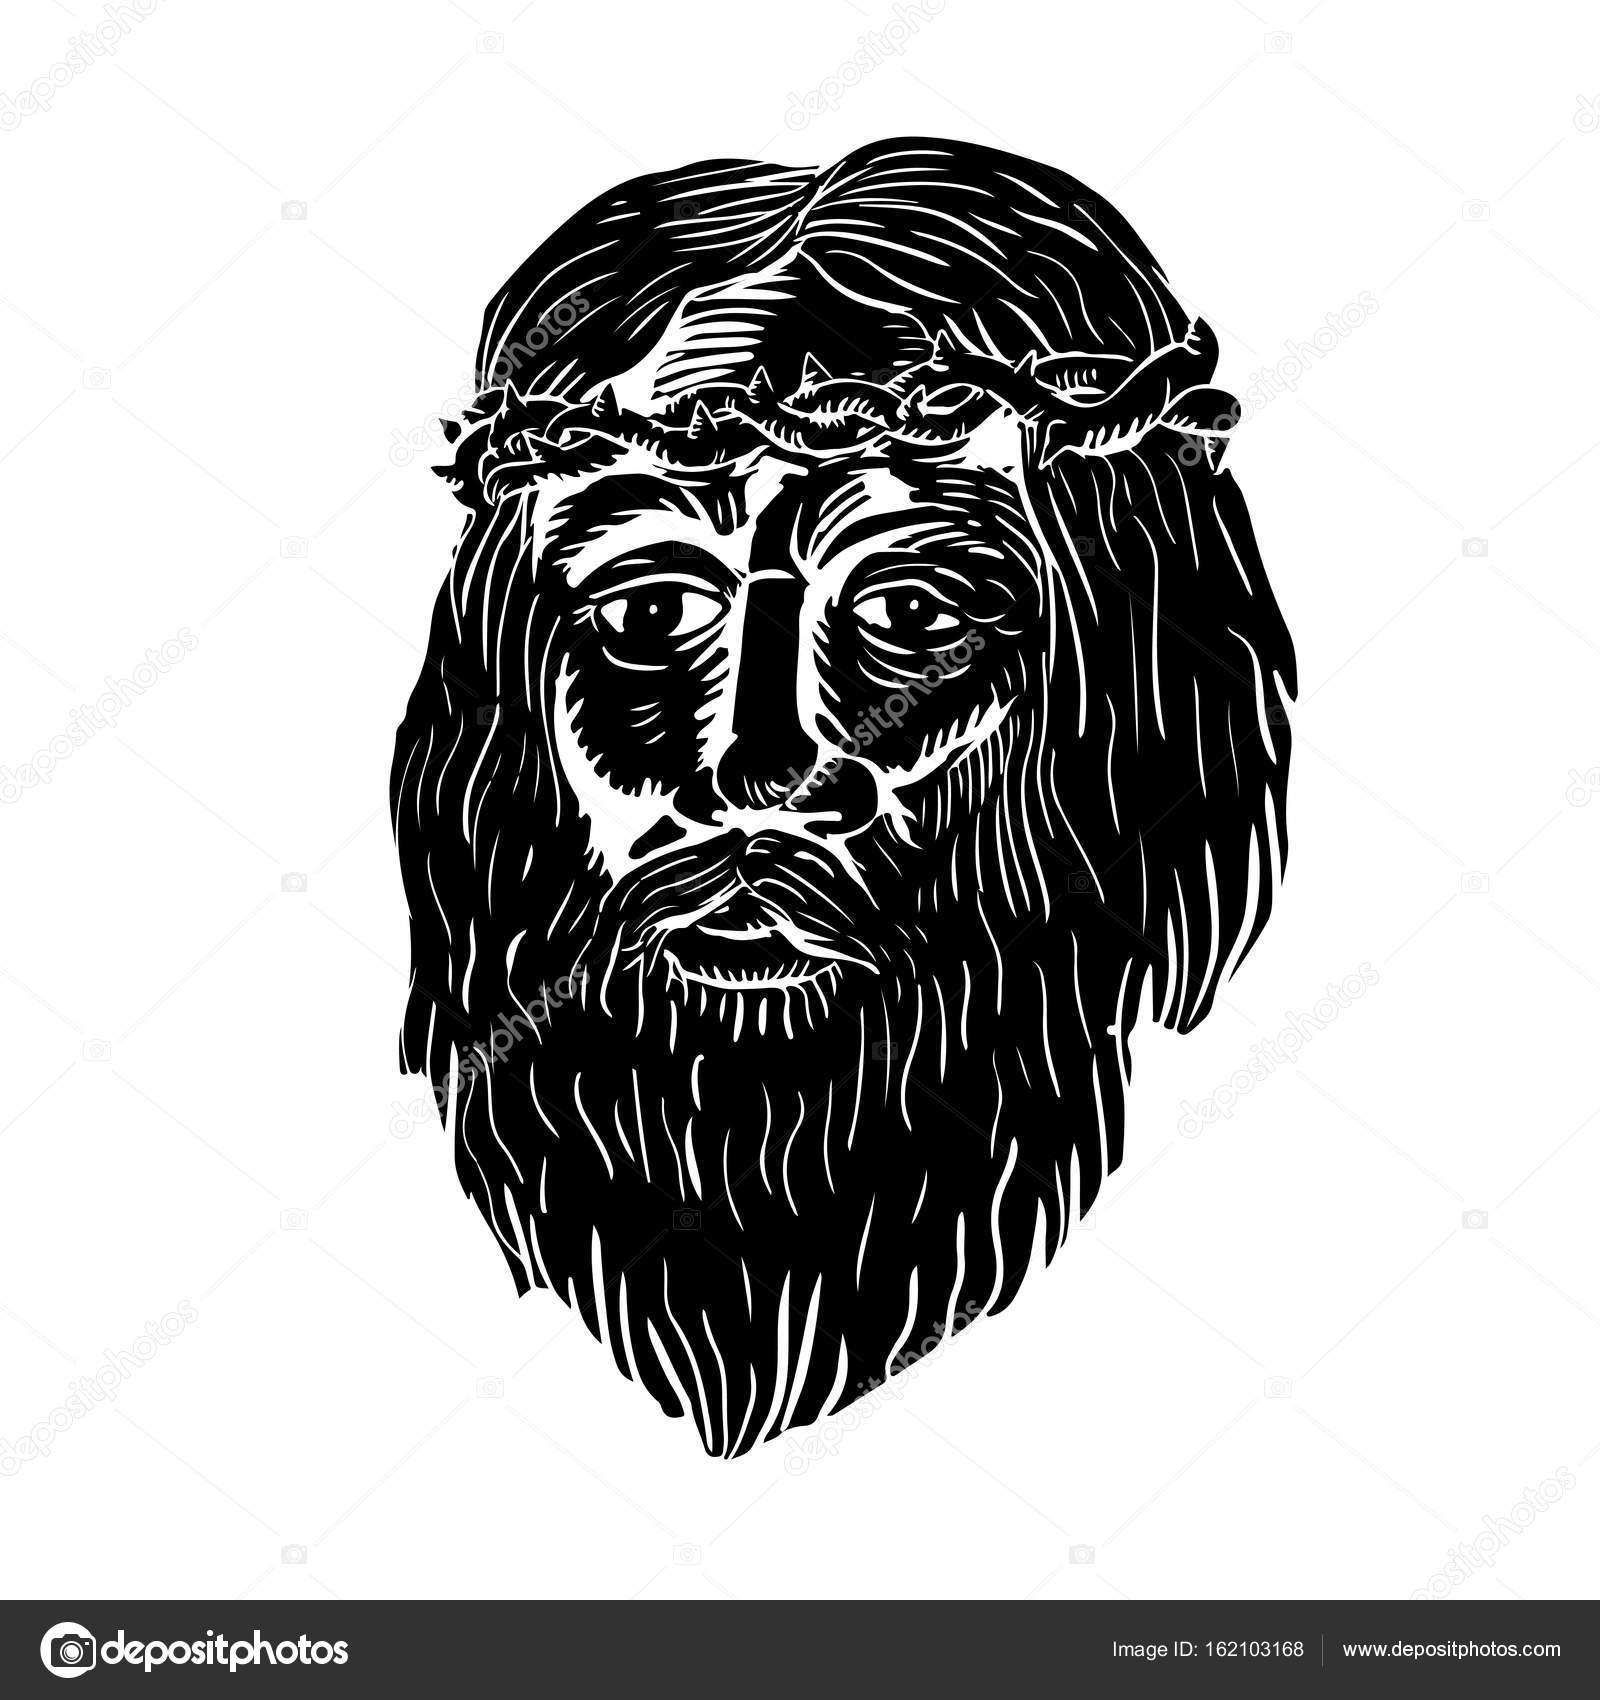 Imágenes Leon Rasta Con Corona Cristo Corona De Espinas Grabado